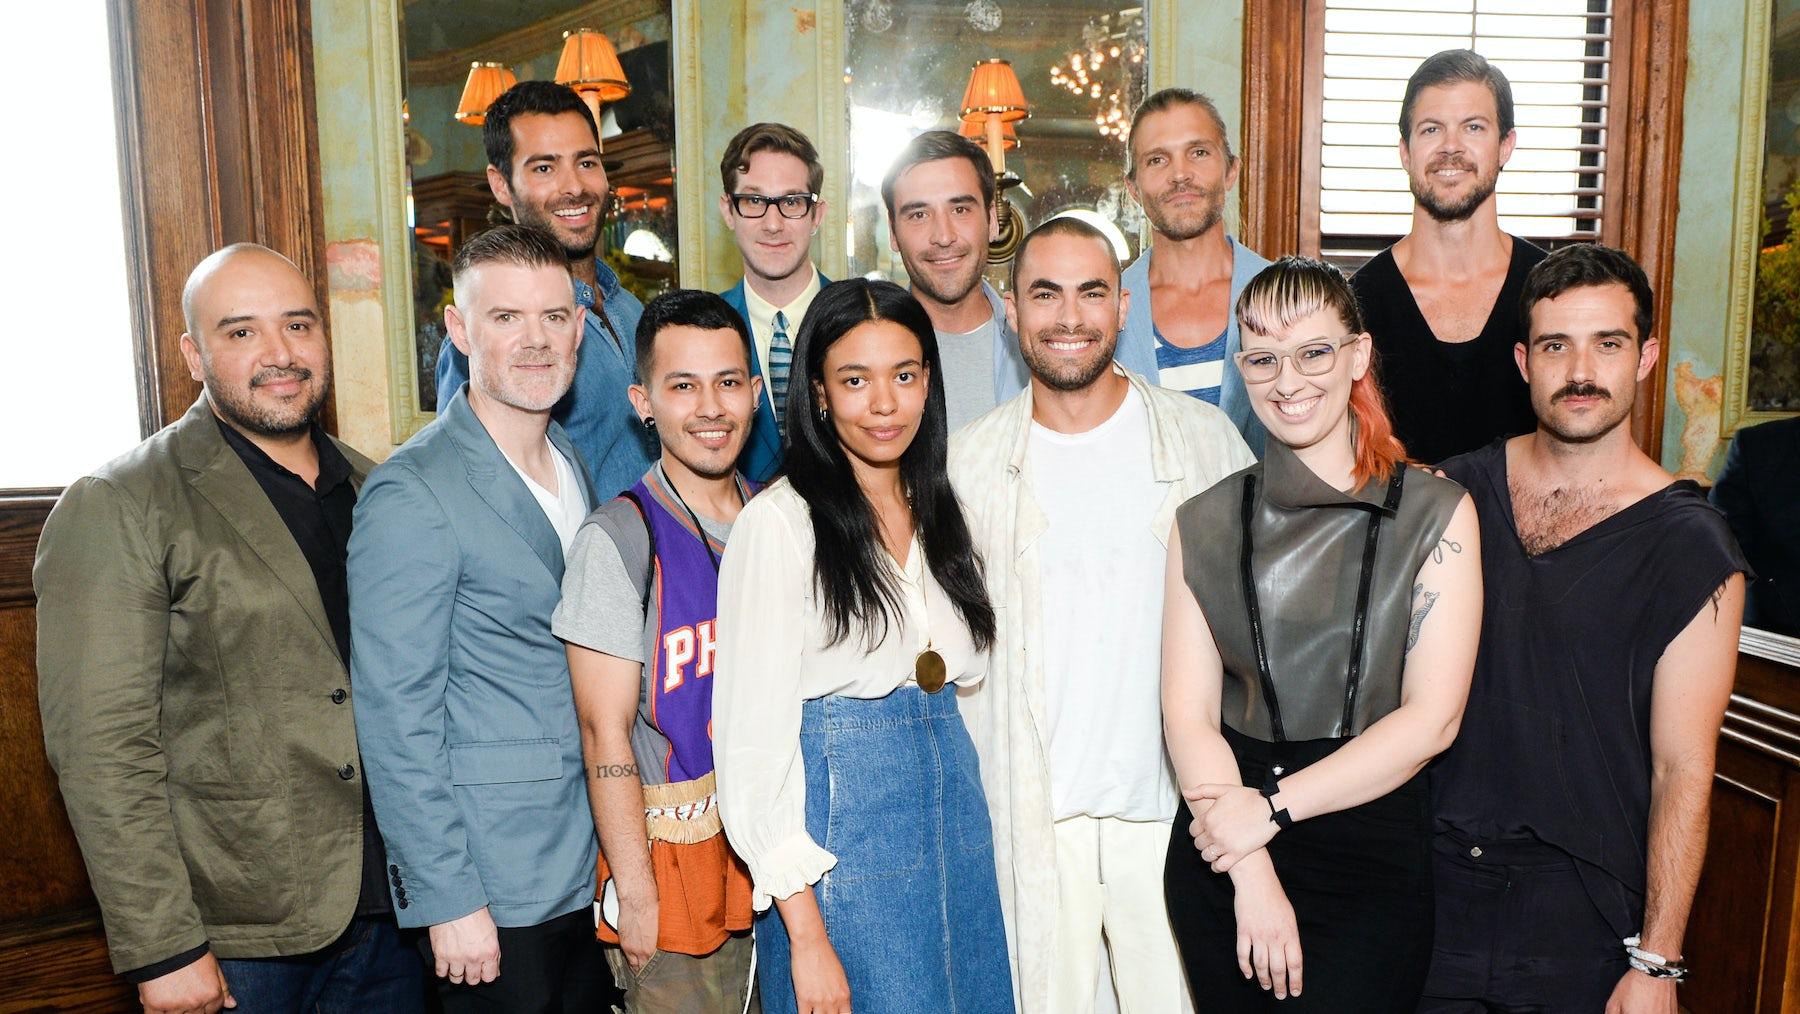 The 2015 Vogue/CFDA Fashion Fund finalists | Photo: Joe Schildhorn/BFA.com